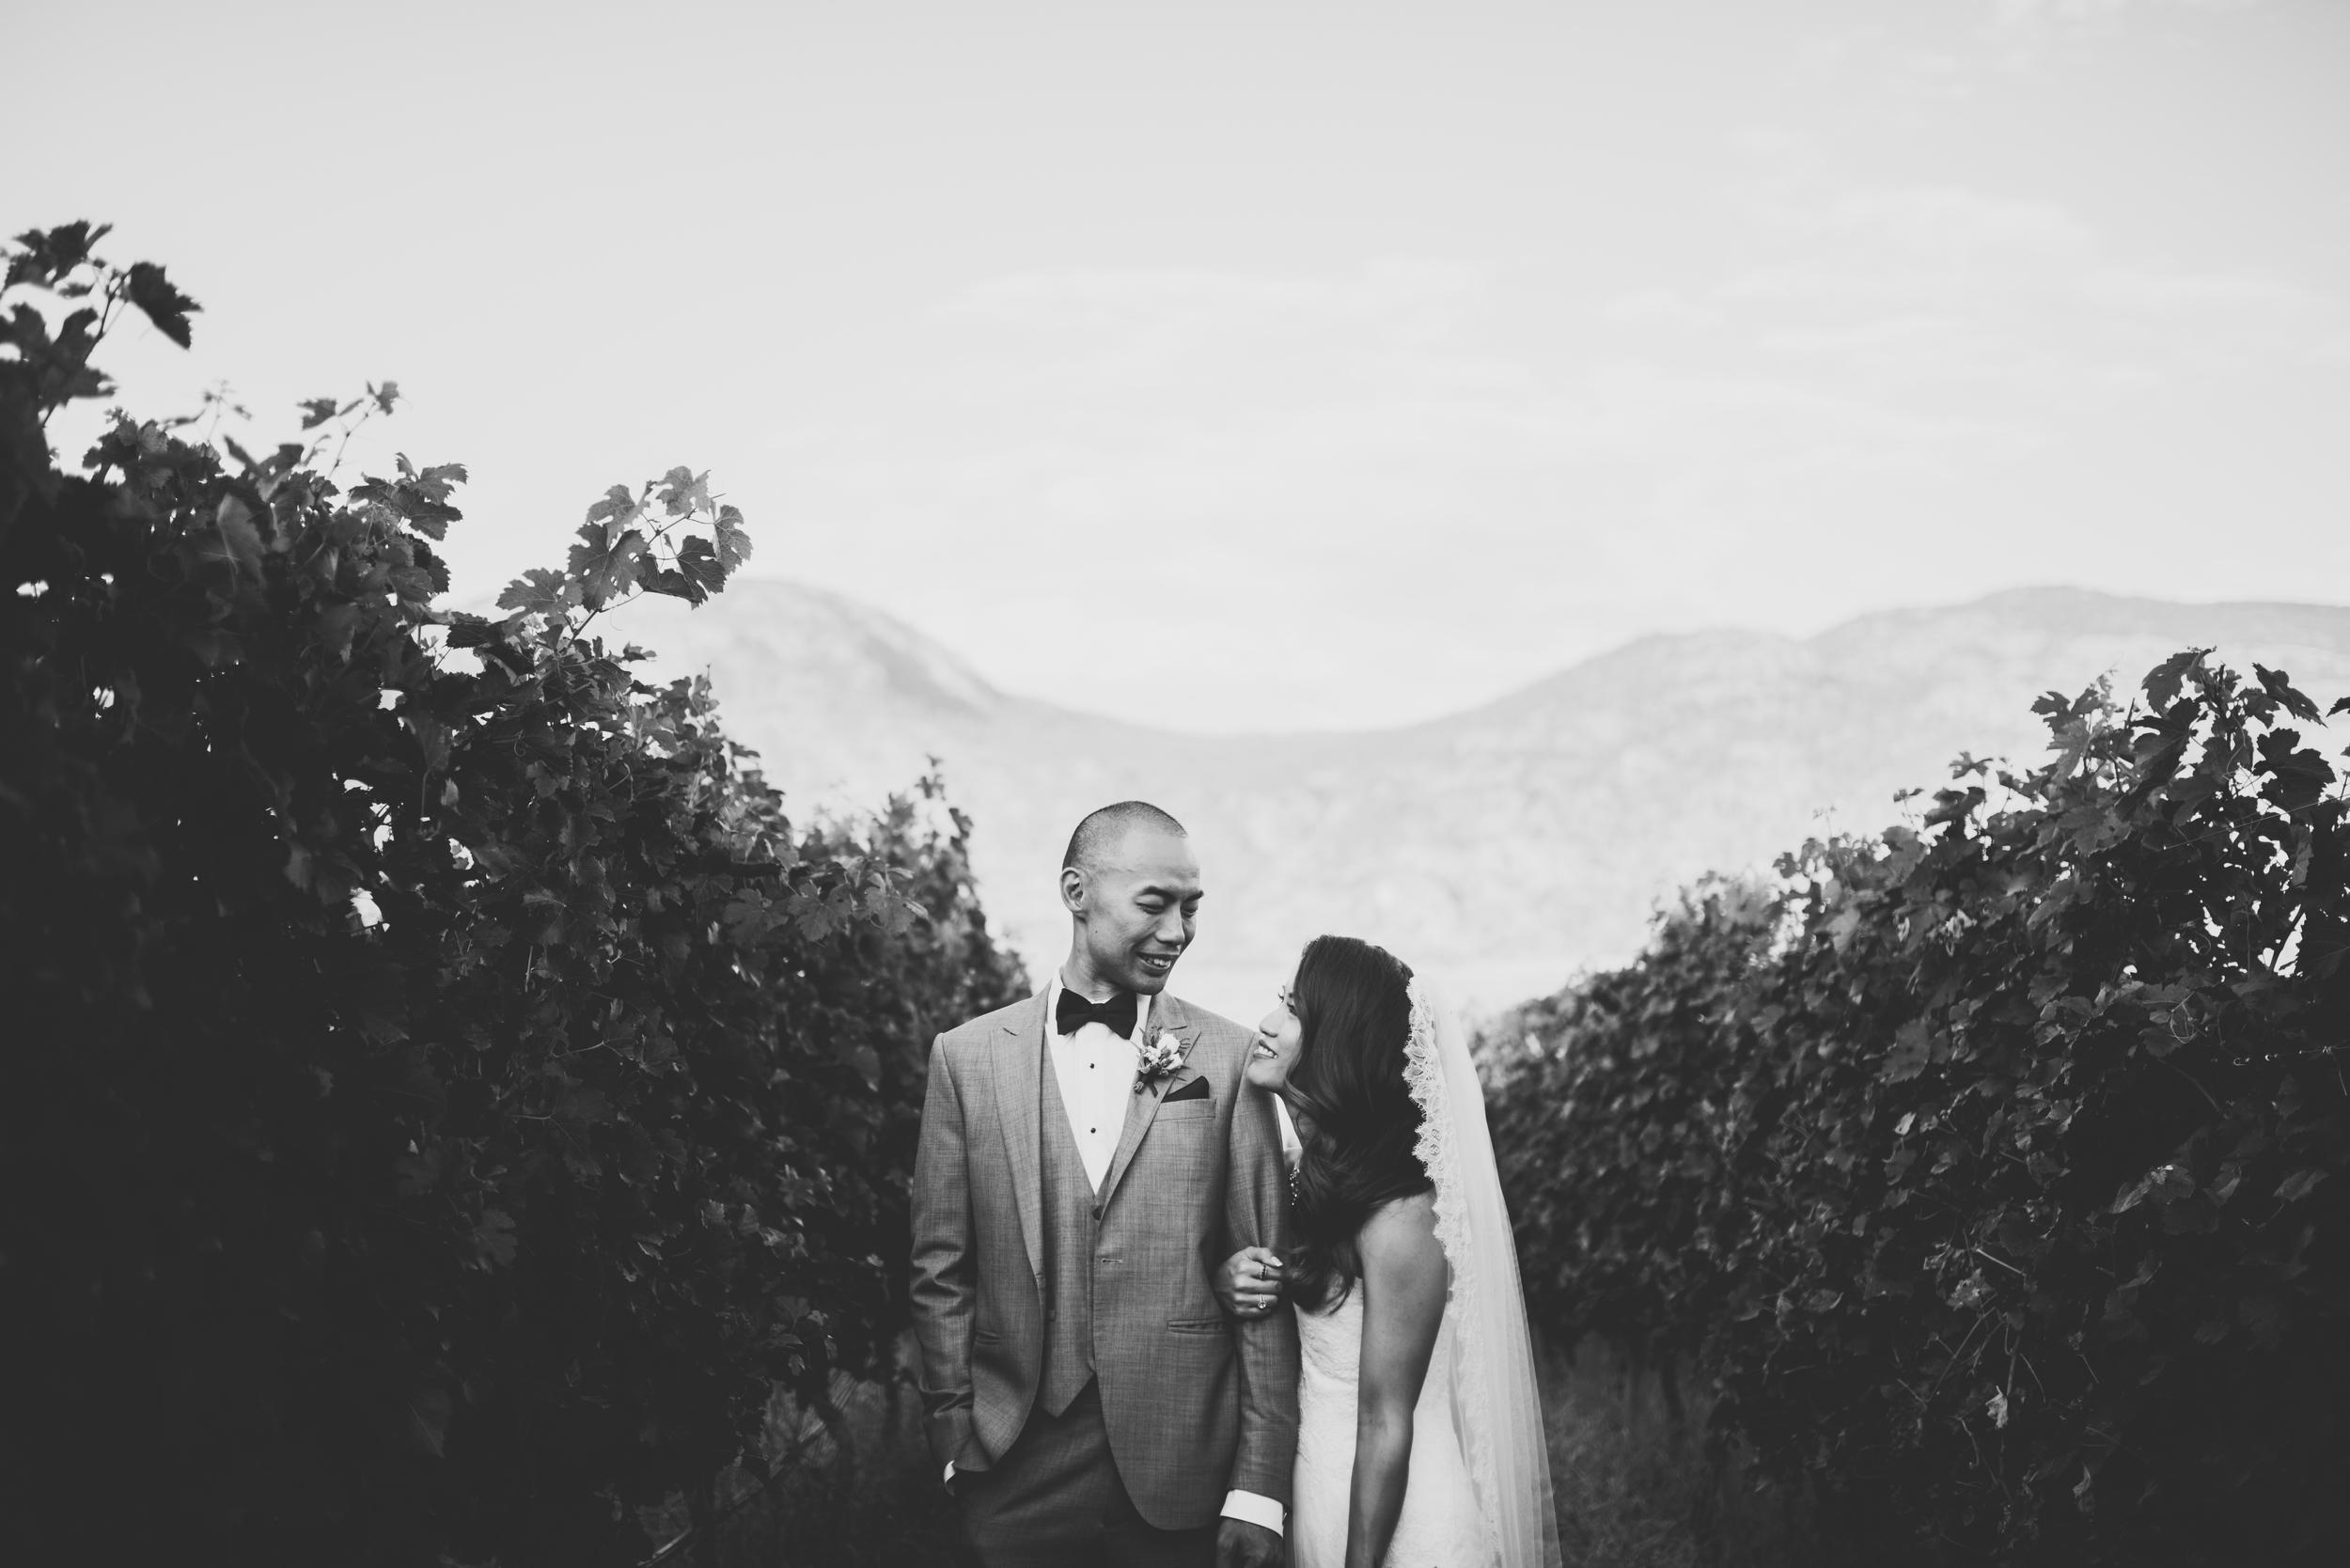 Paul & Joanna - © Dallas Kolotylo Photography - 637.jpg